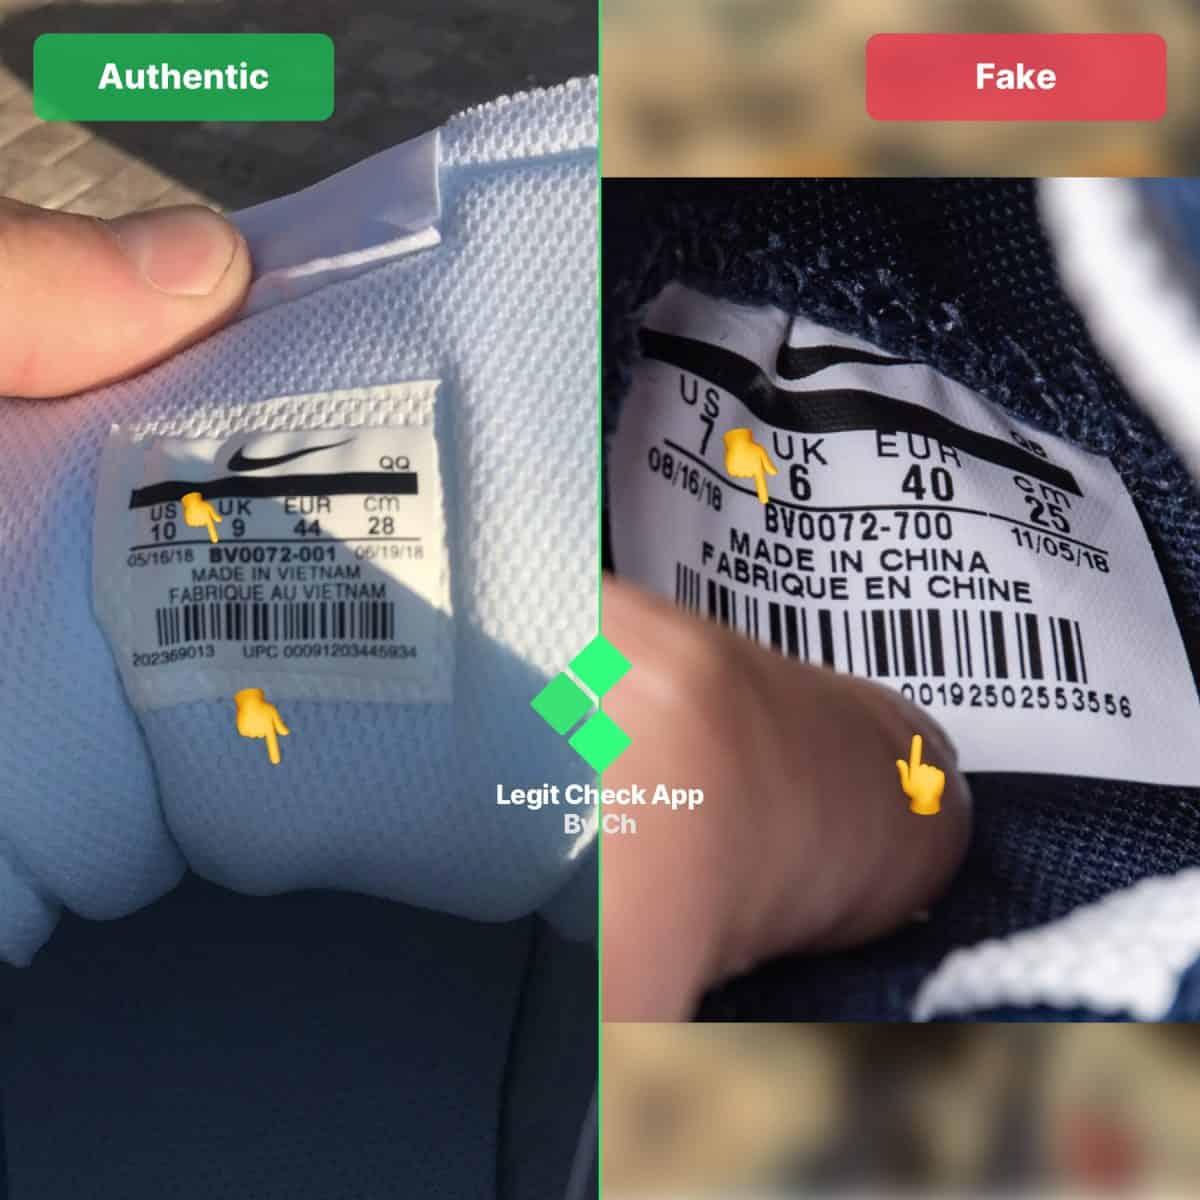 Nike Sacai Blazer Fake vs Real Guide